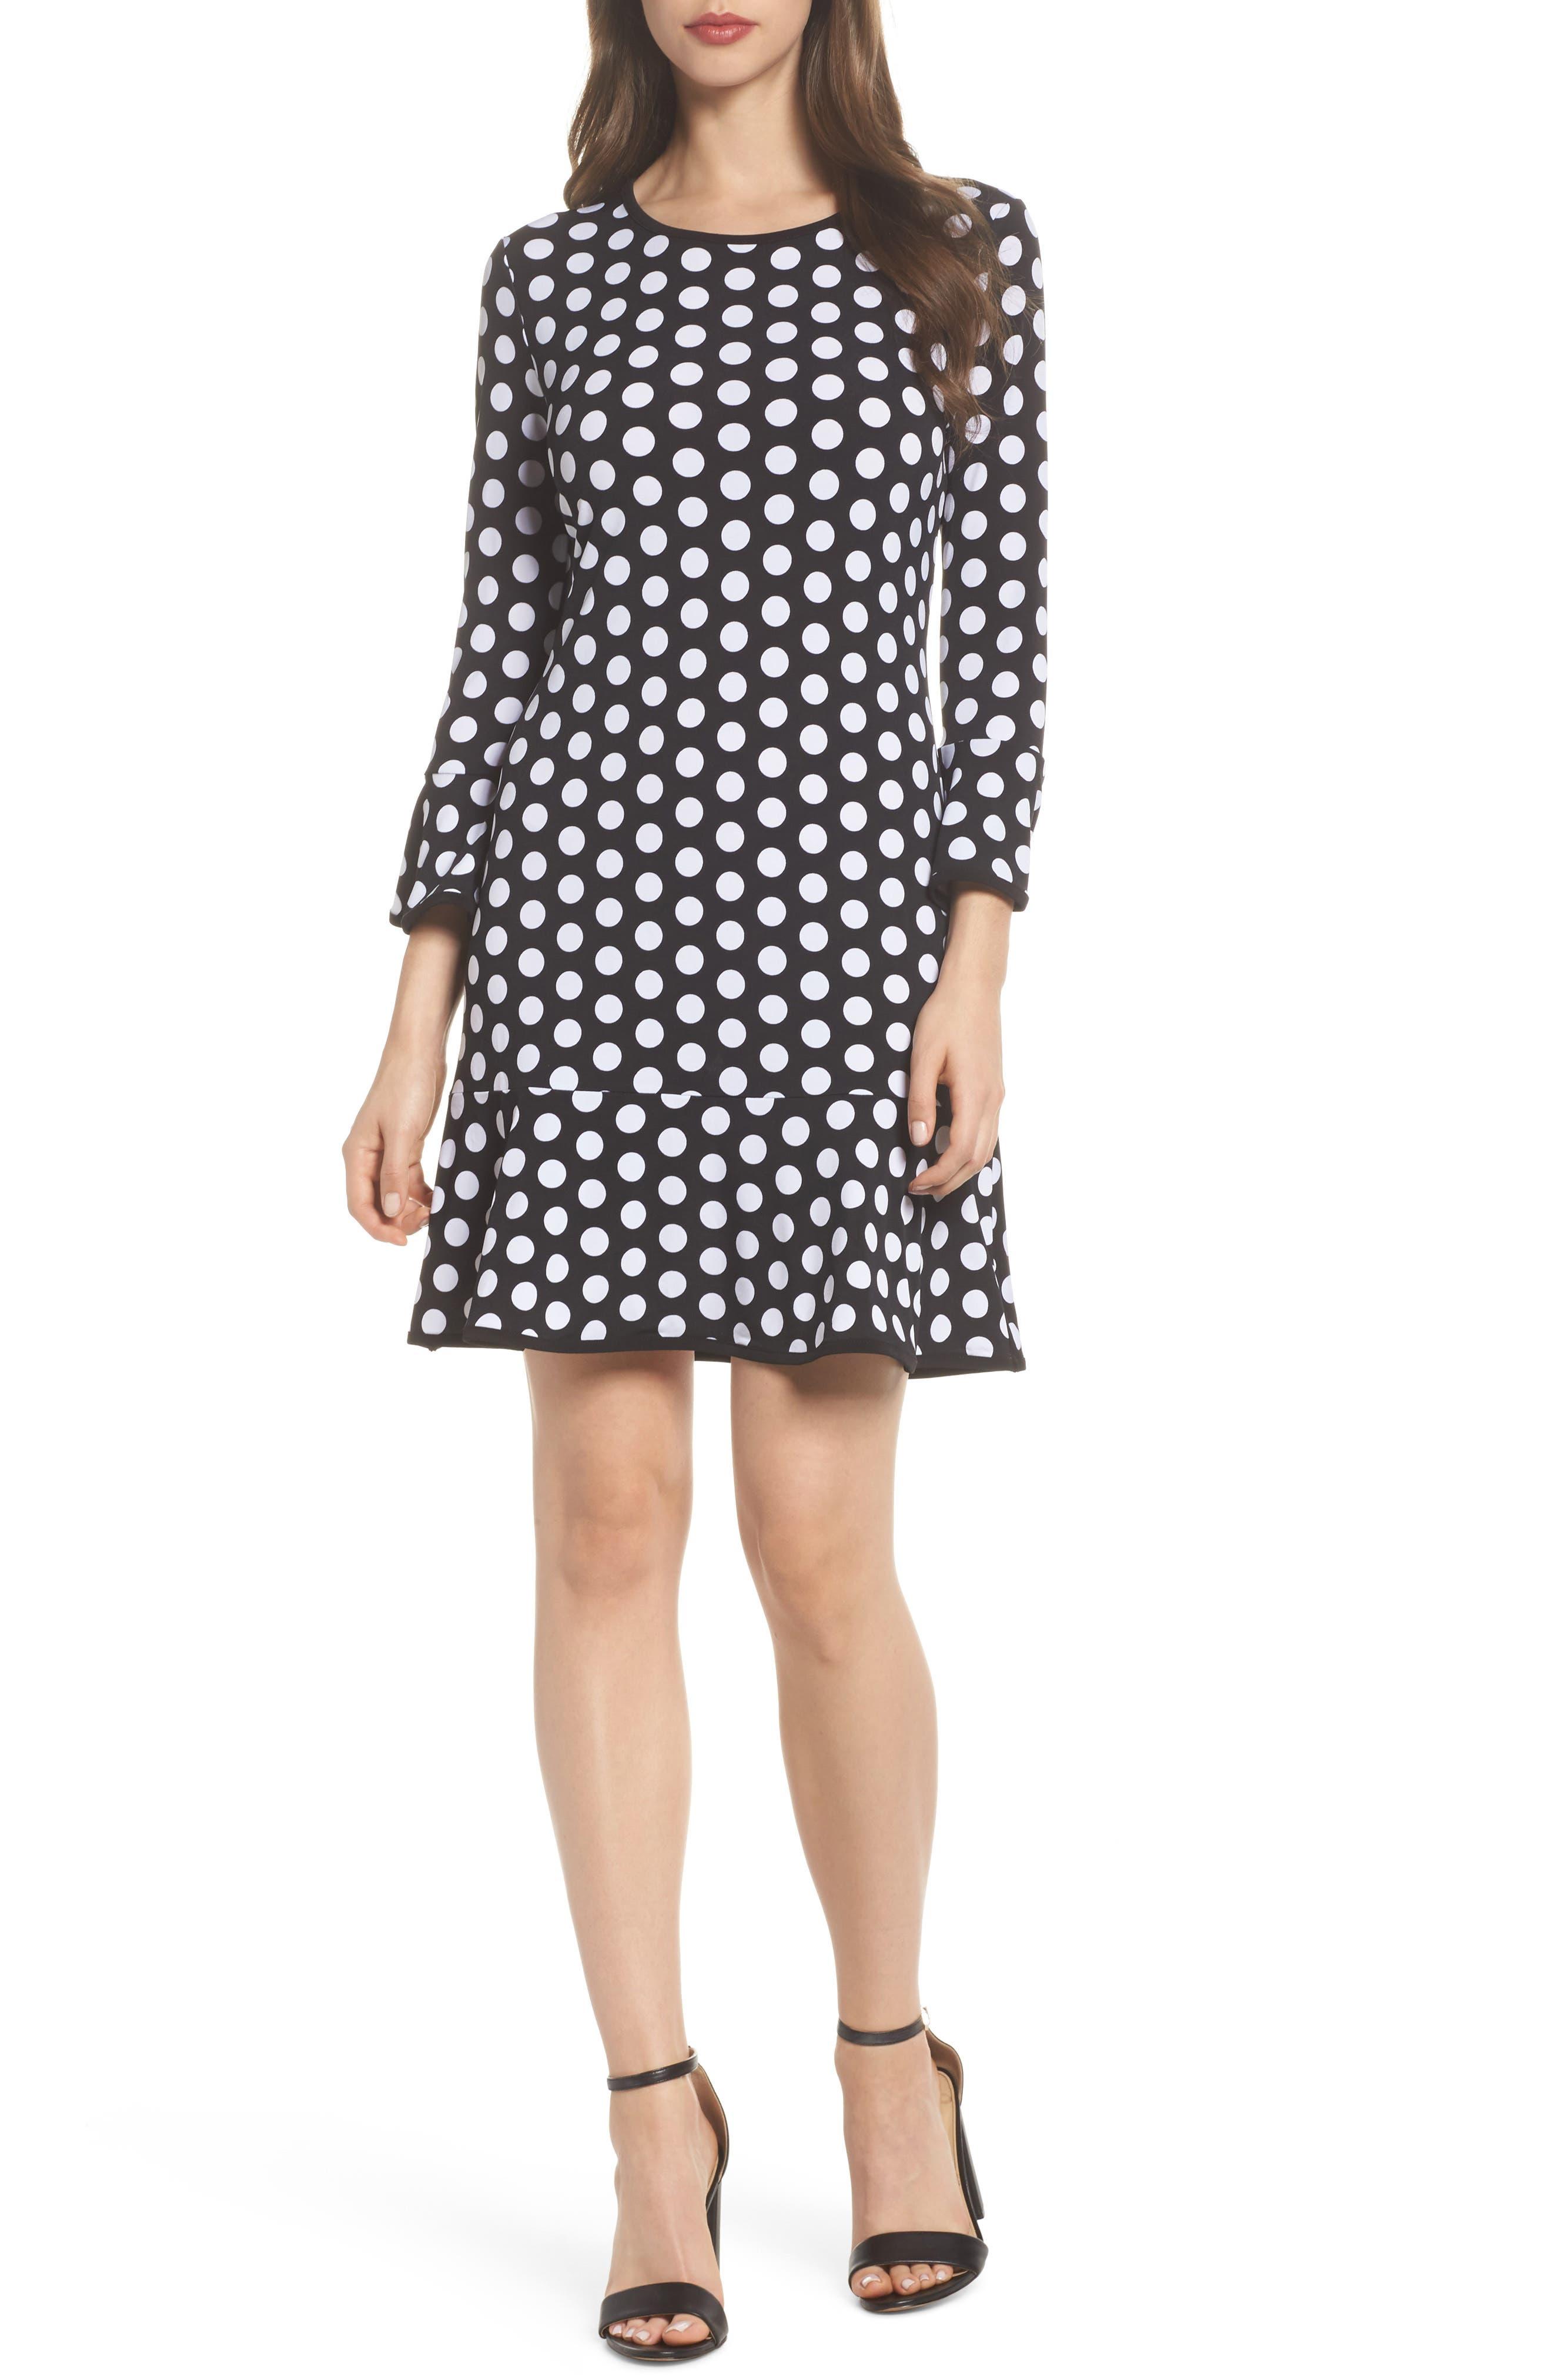 Simple Dot Swing Dress,                         Main,                         color, Black/ White